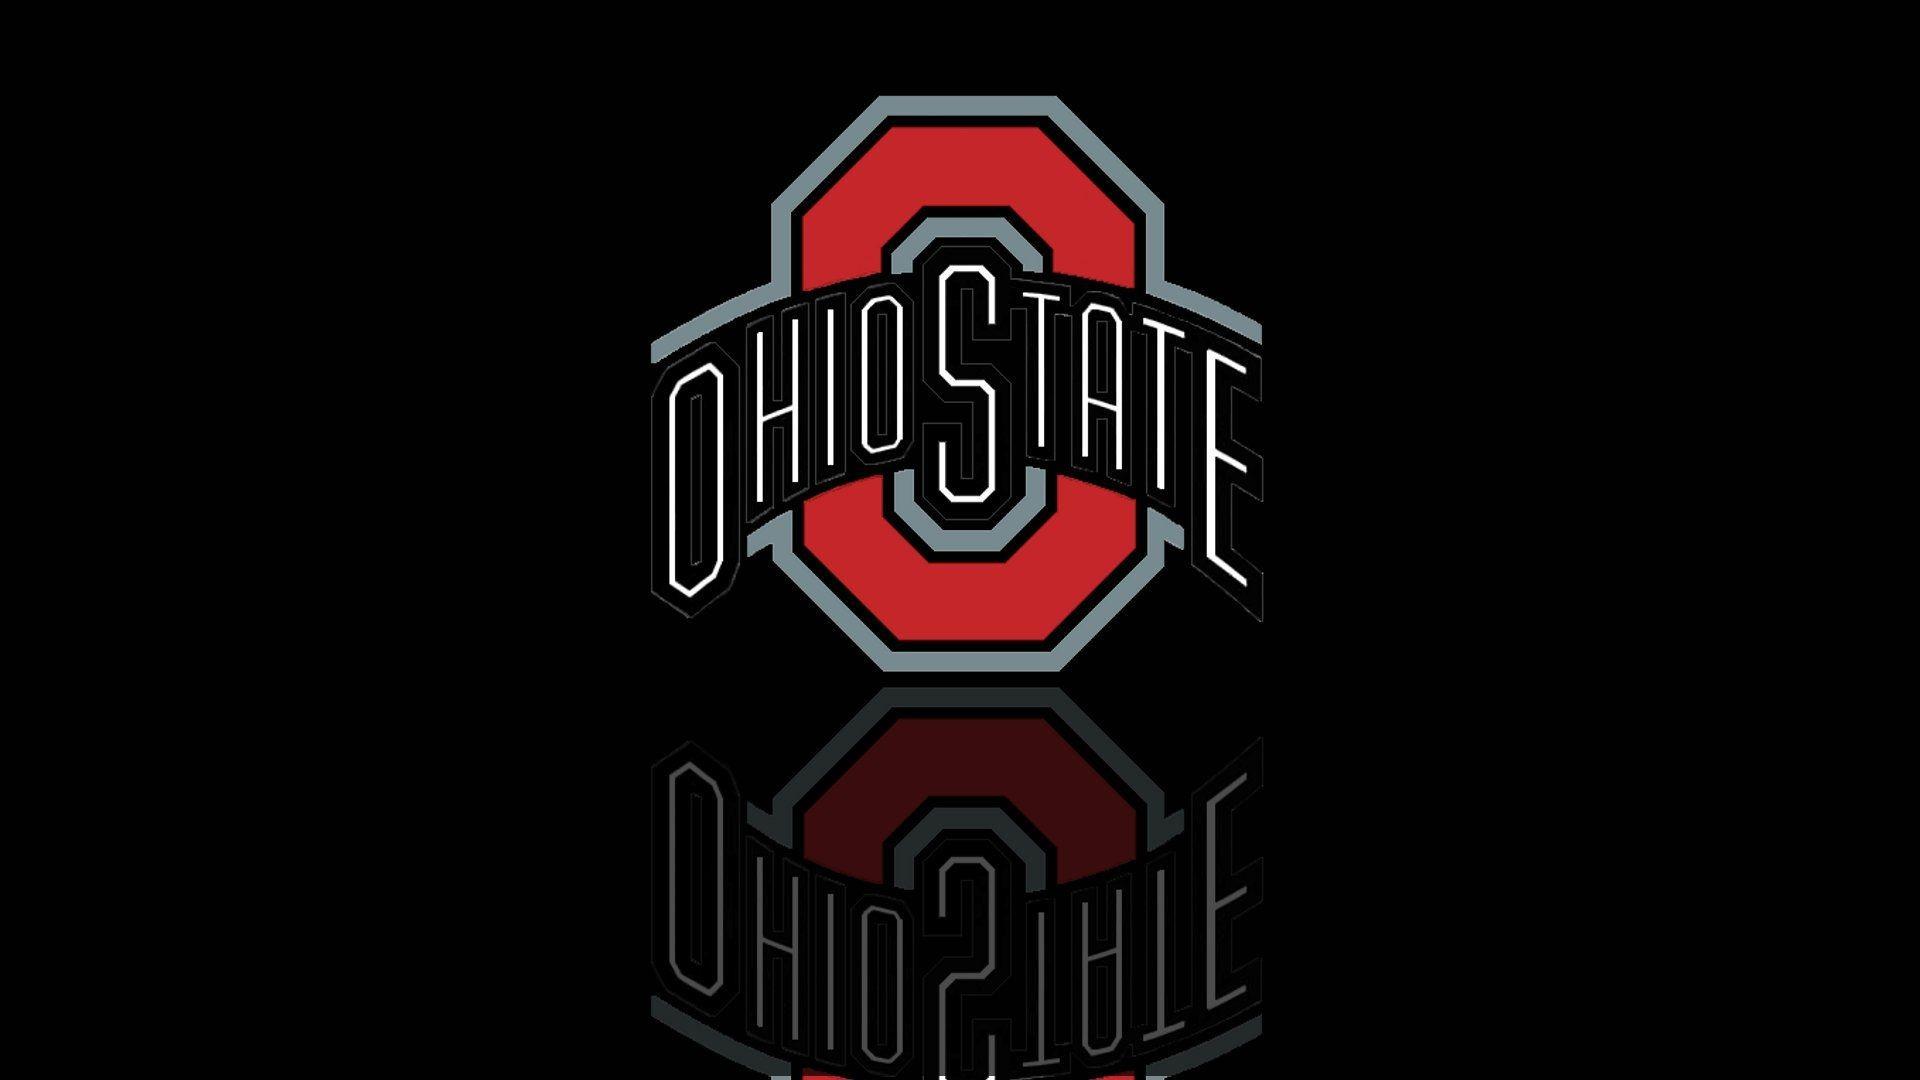 Ohio State Buckeyes Football Wallpapers Wallpaper